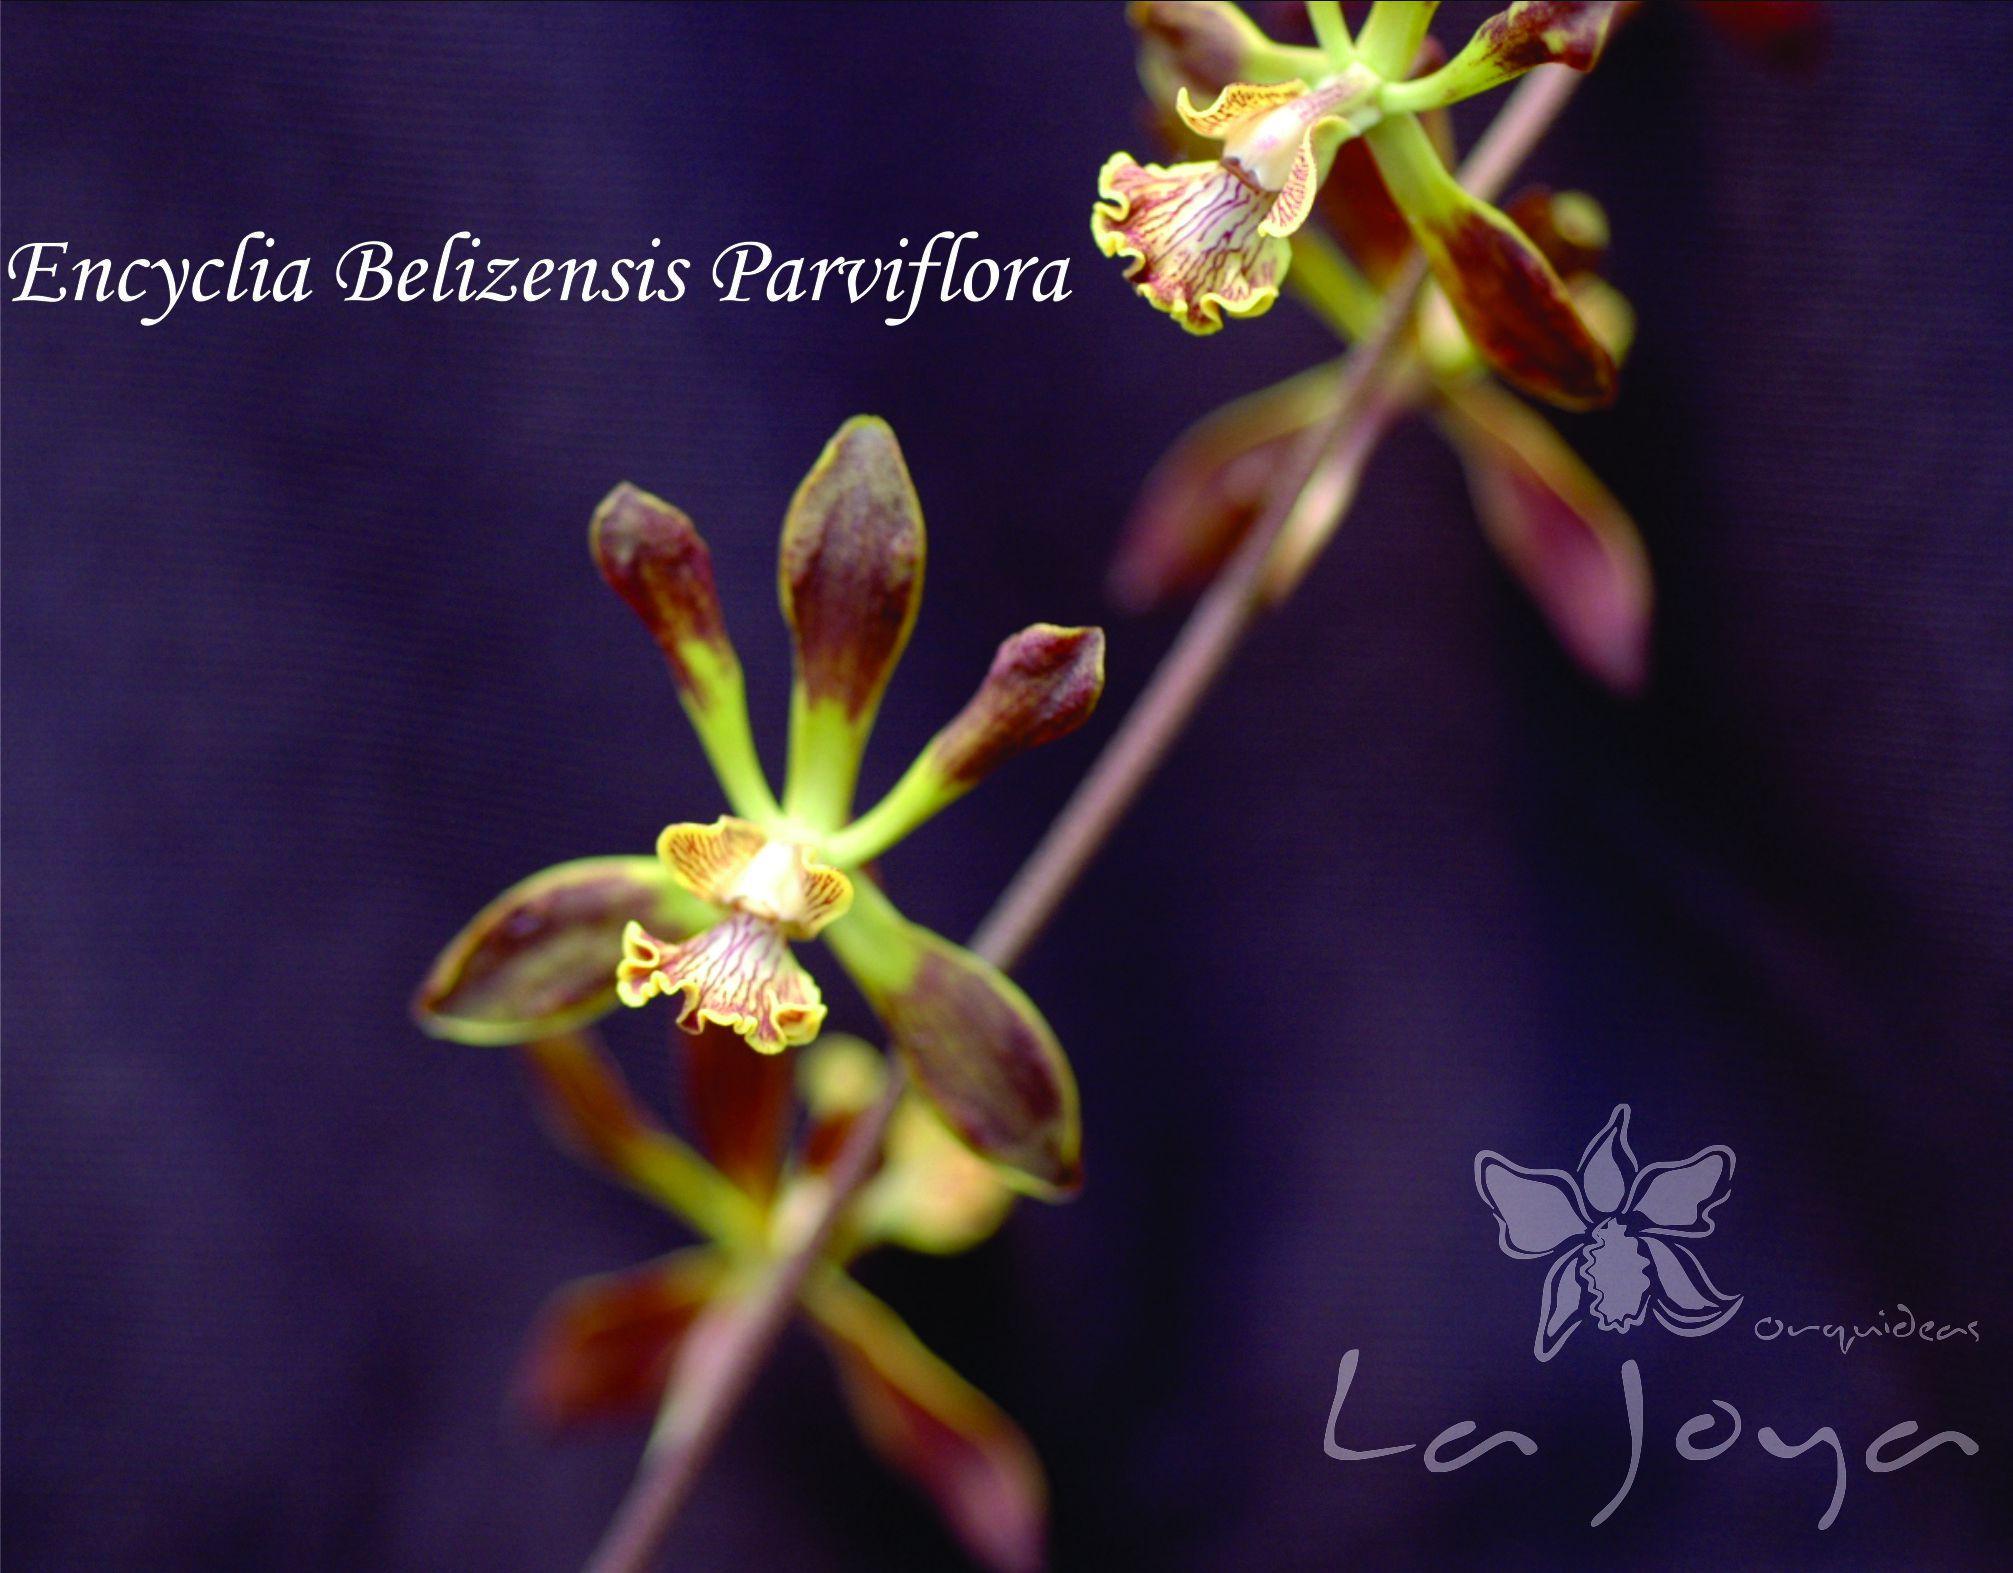 Encyclia Belizenses Parviflora